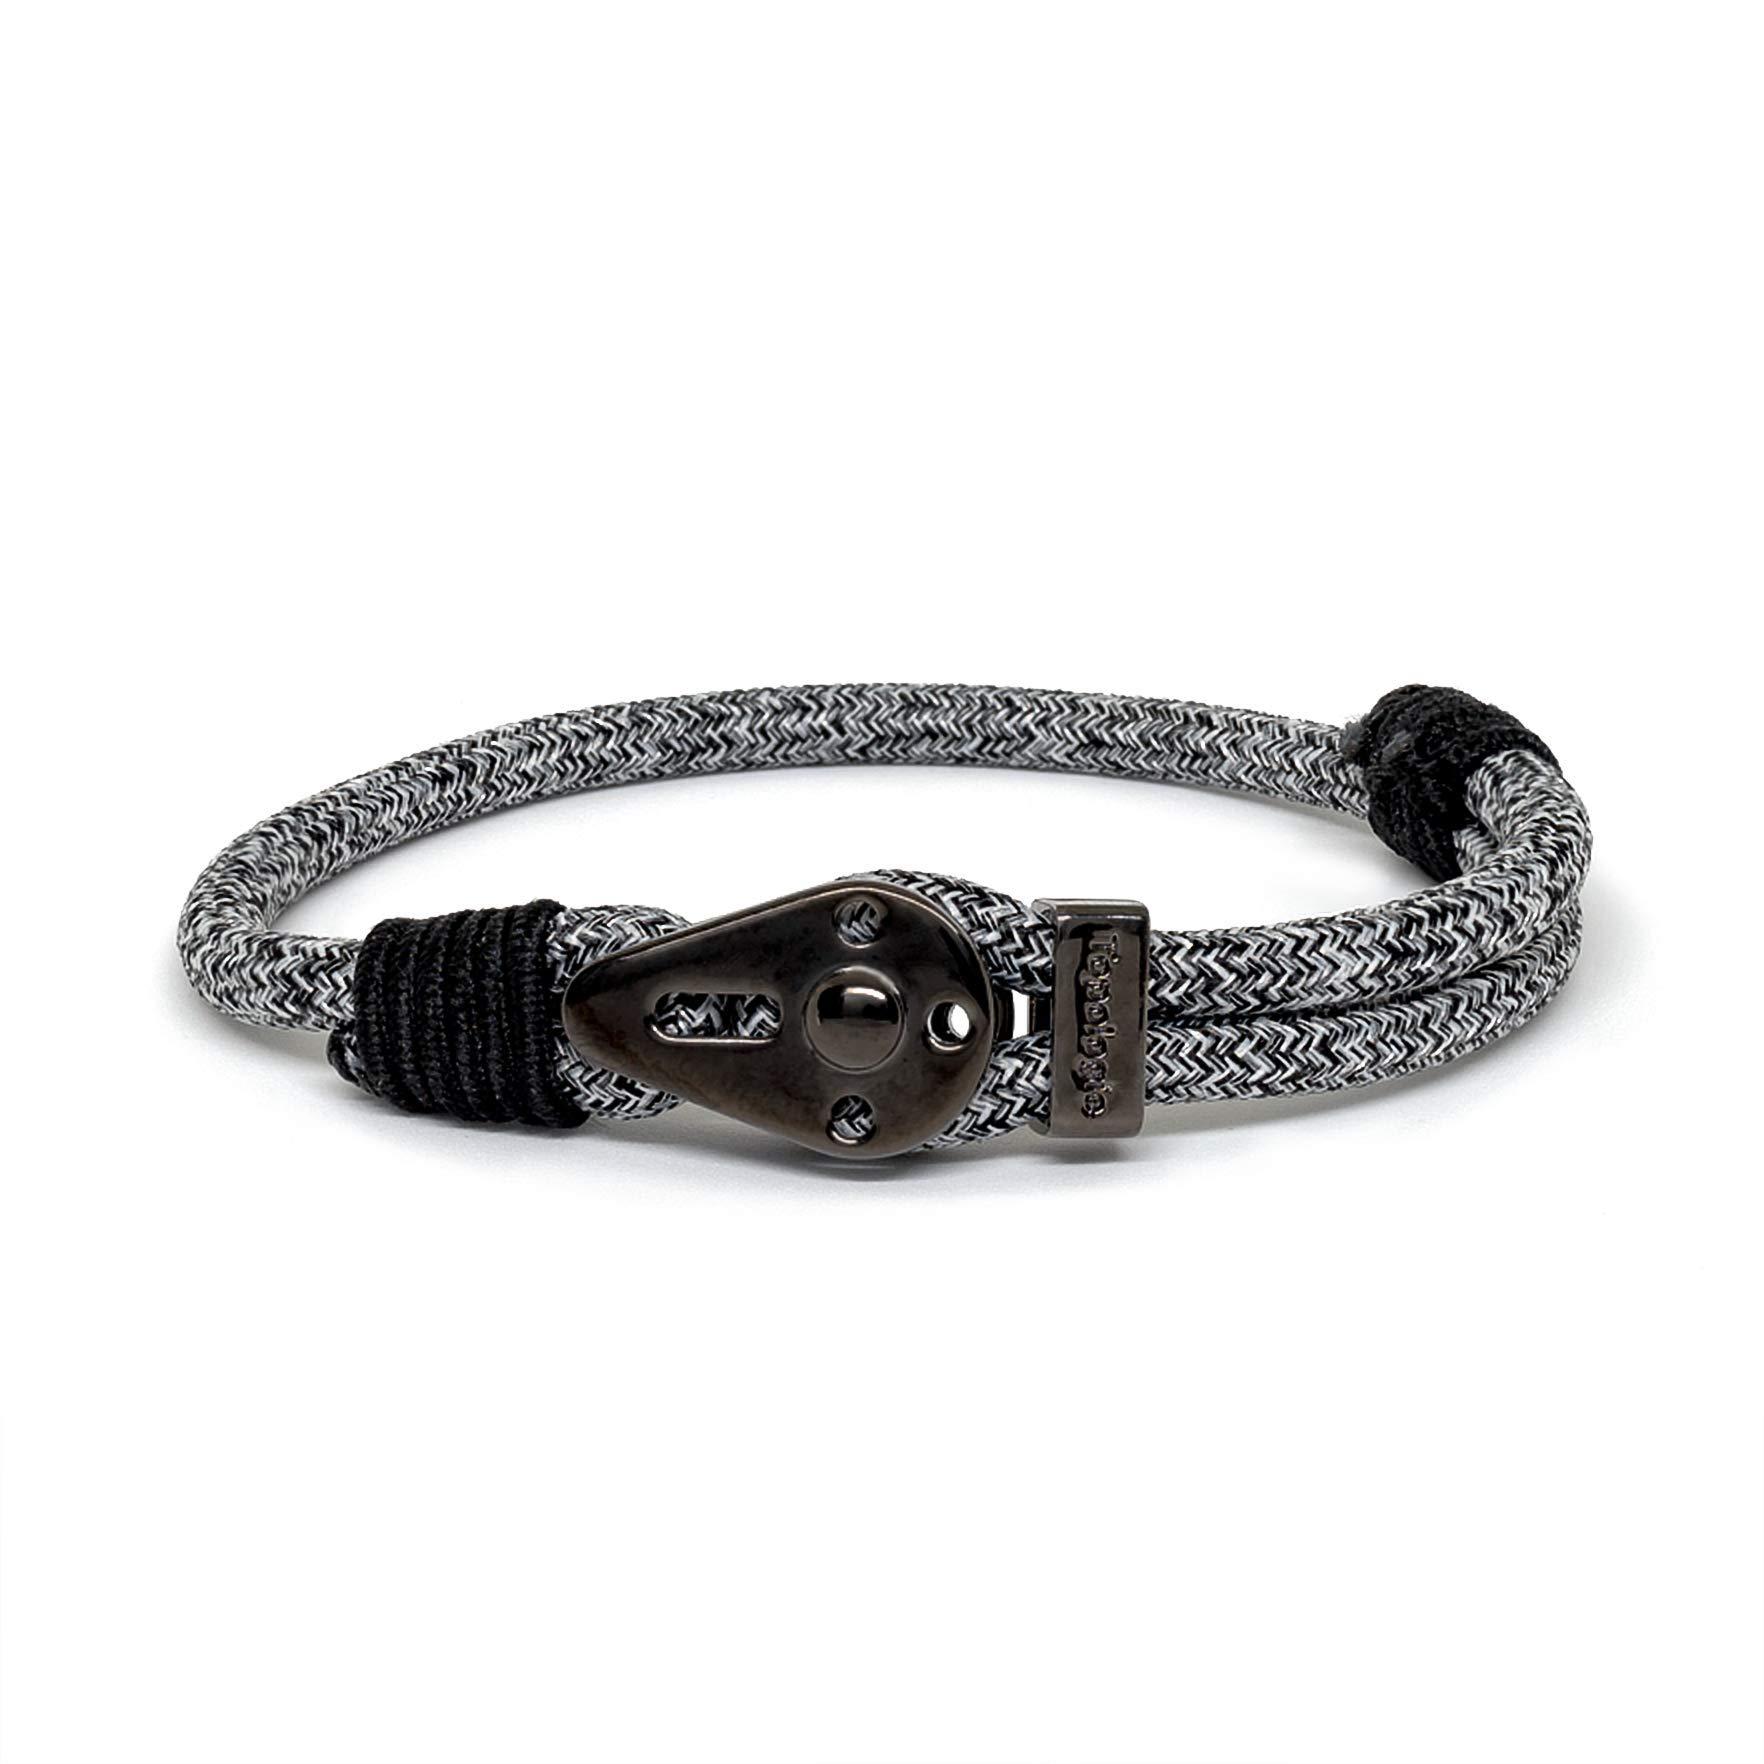 Topologie Bracelets Yosemite Chrome Black Black Melange 5mm